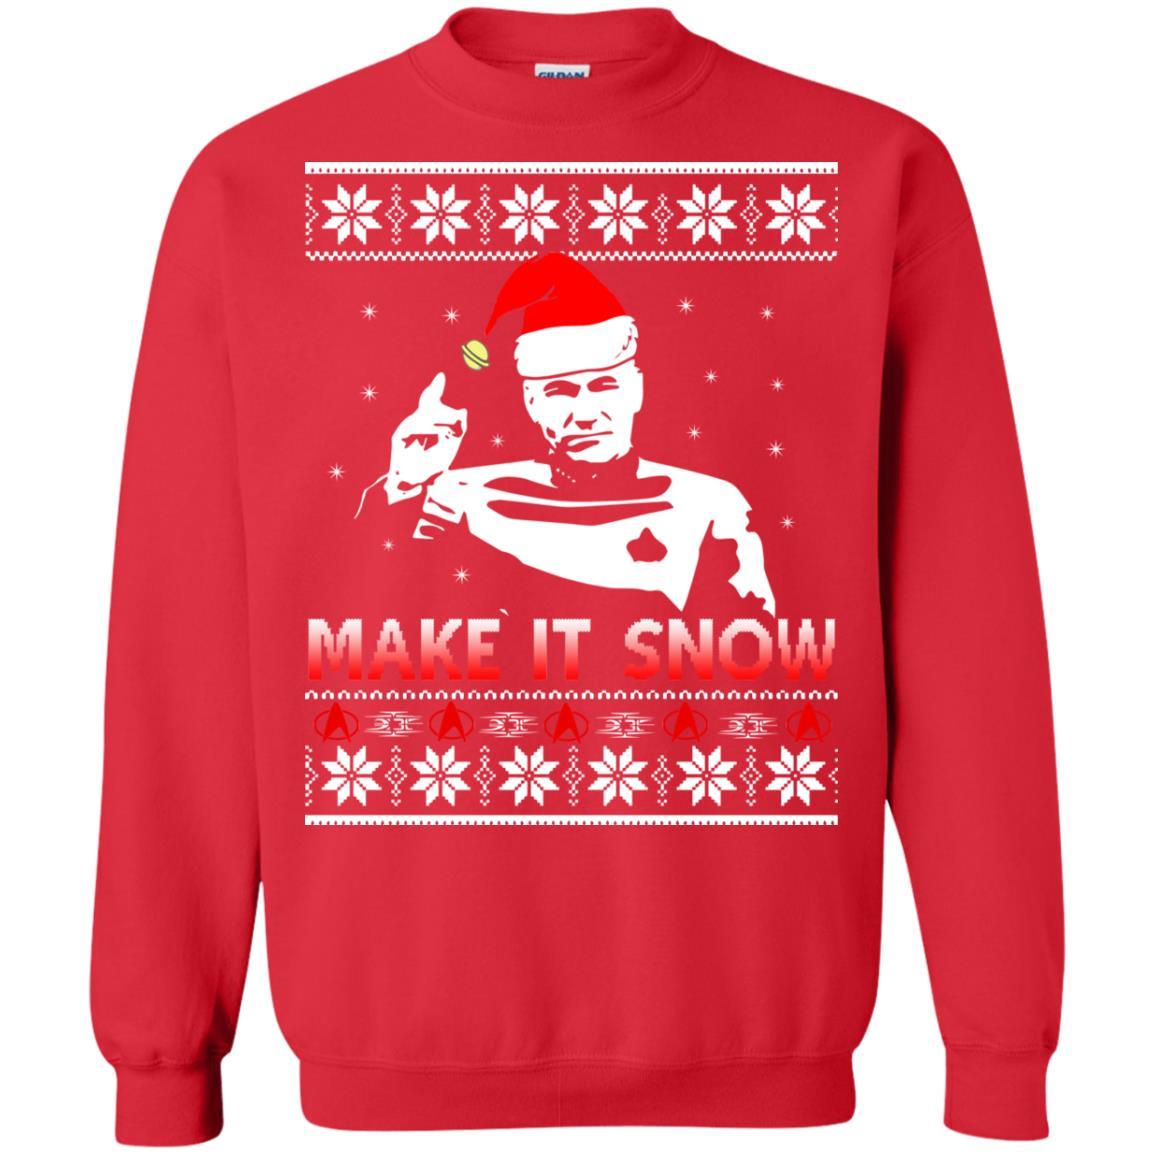 image 2415 - Star Trek make it snow Christmas Sweater, Shirt